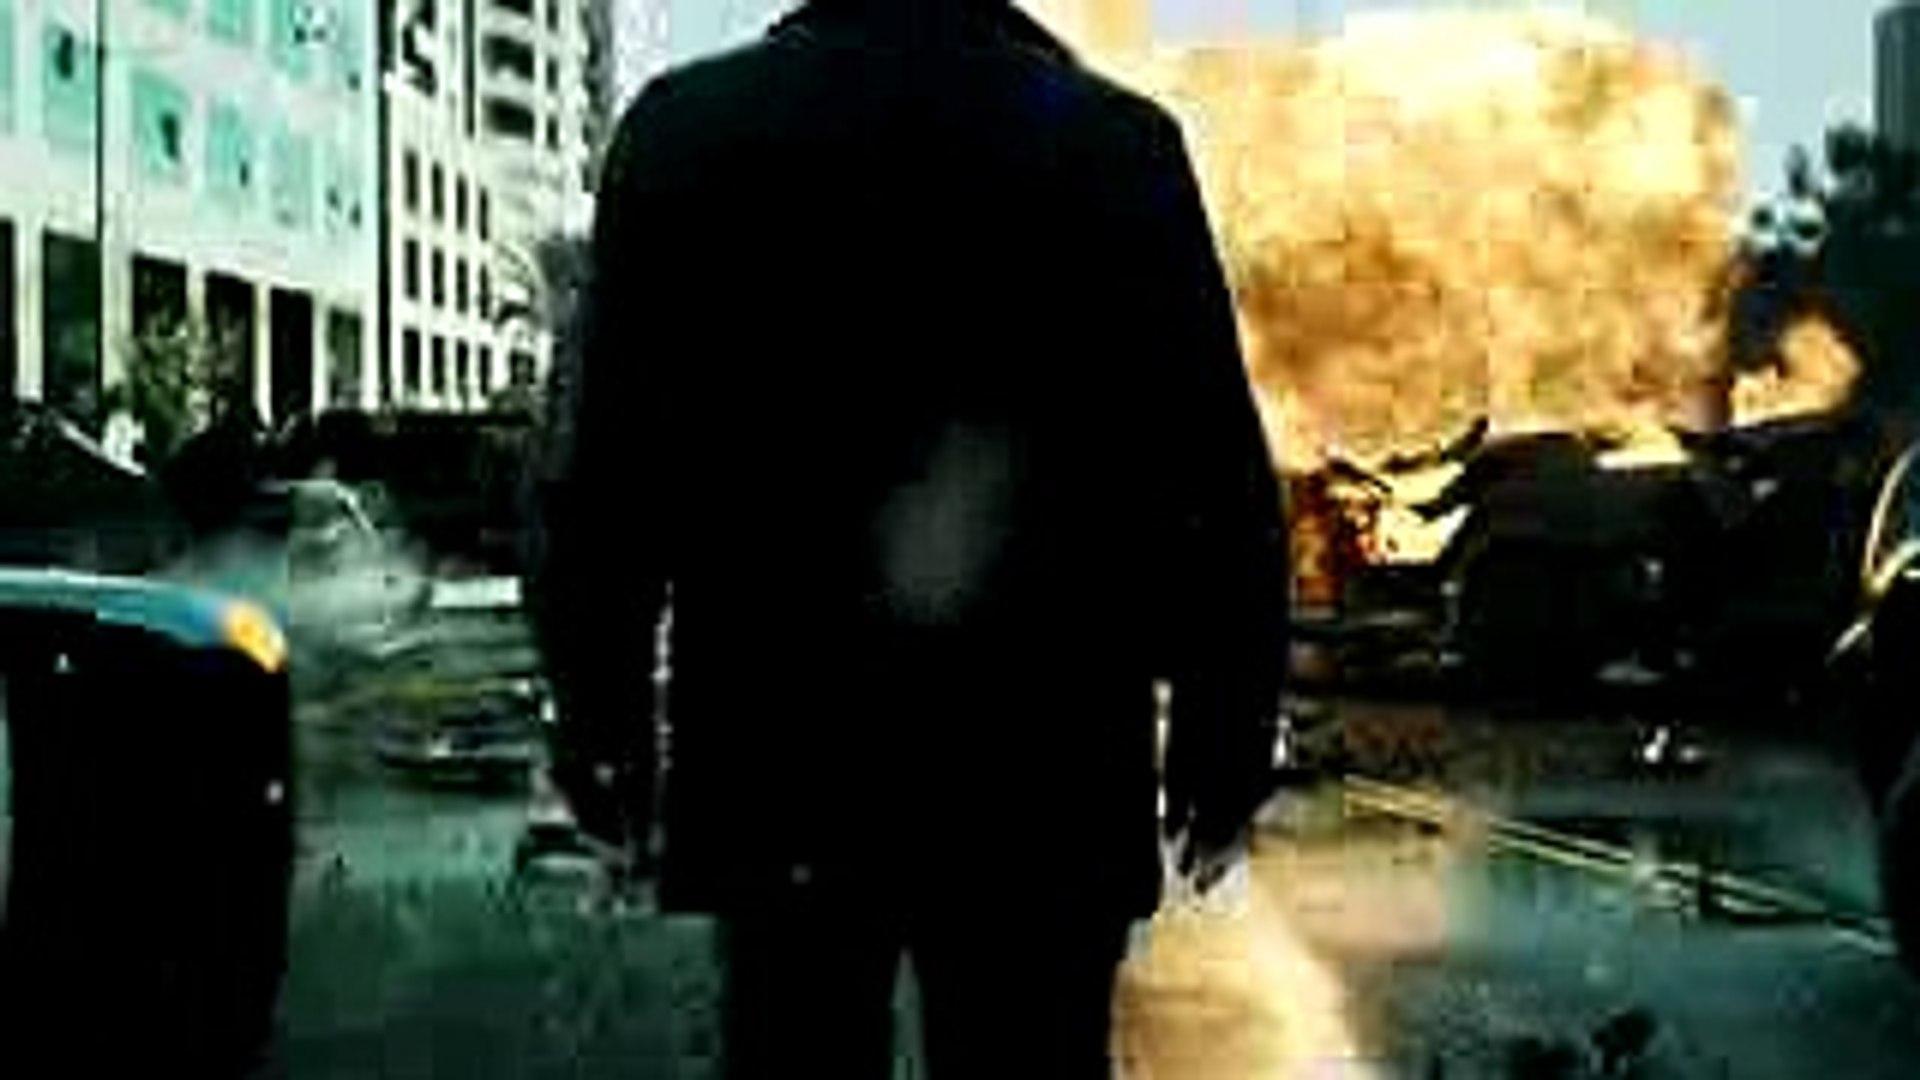 The Blacklist season 5 Trailer